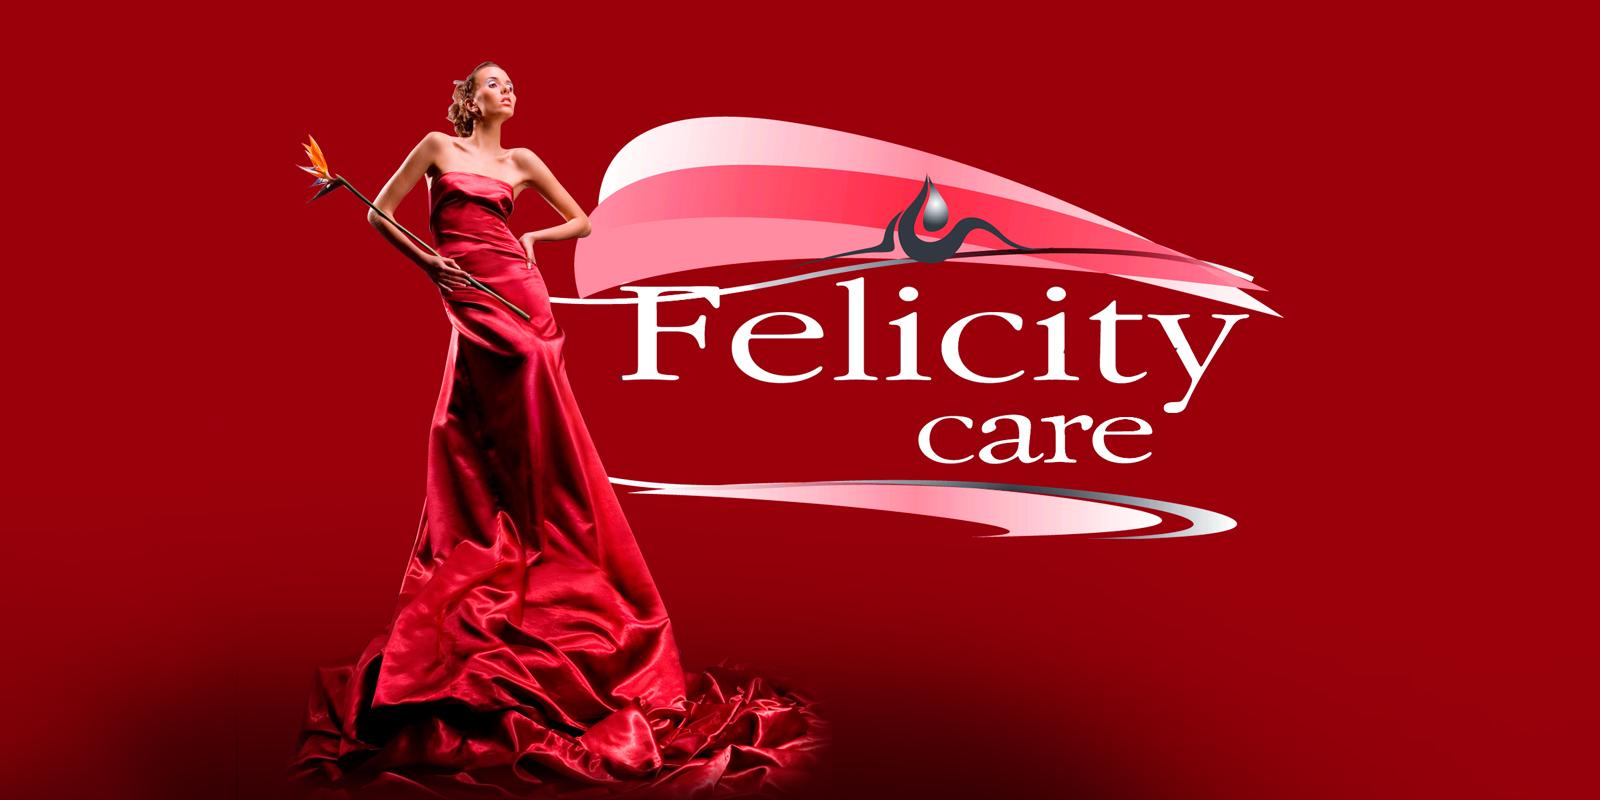 TM Feliciti Care;;;;;;Логотип и торговый знак (средства по уходу за волосами);;;;;;<span>Клиент:</span> Компания «Armoni»;;;;;;;;;;;;Логотип и торговый знак (средства по уходу за волосами);;;;;; 1 ;;;;;;